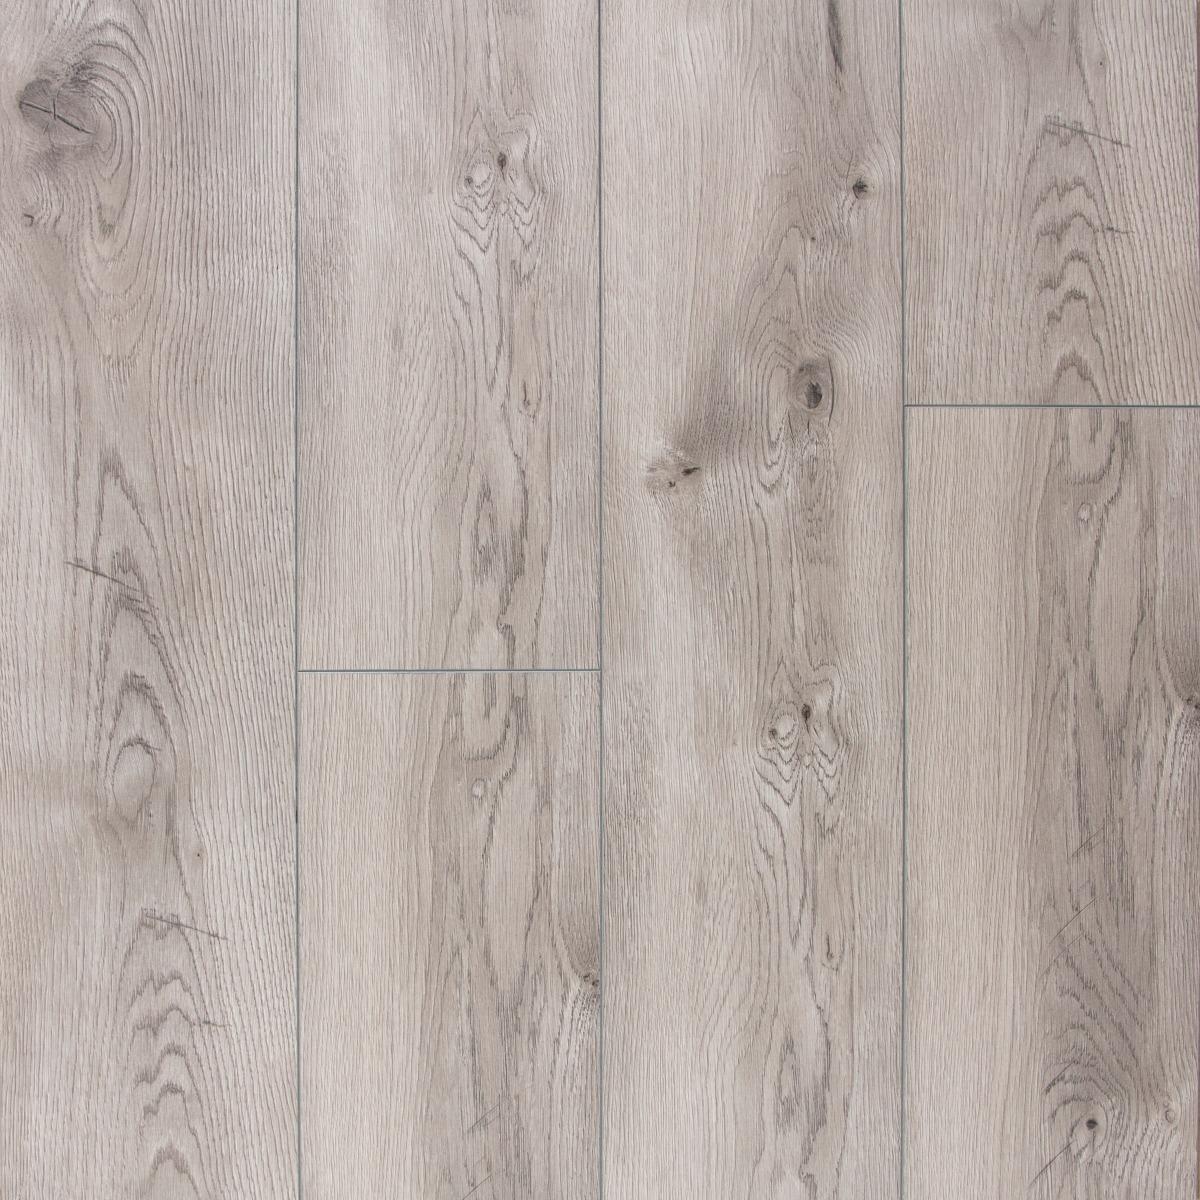 Pearl Gray Waterproof Laminate Flooring, Sam's Club Laminate Flooring Reviews